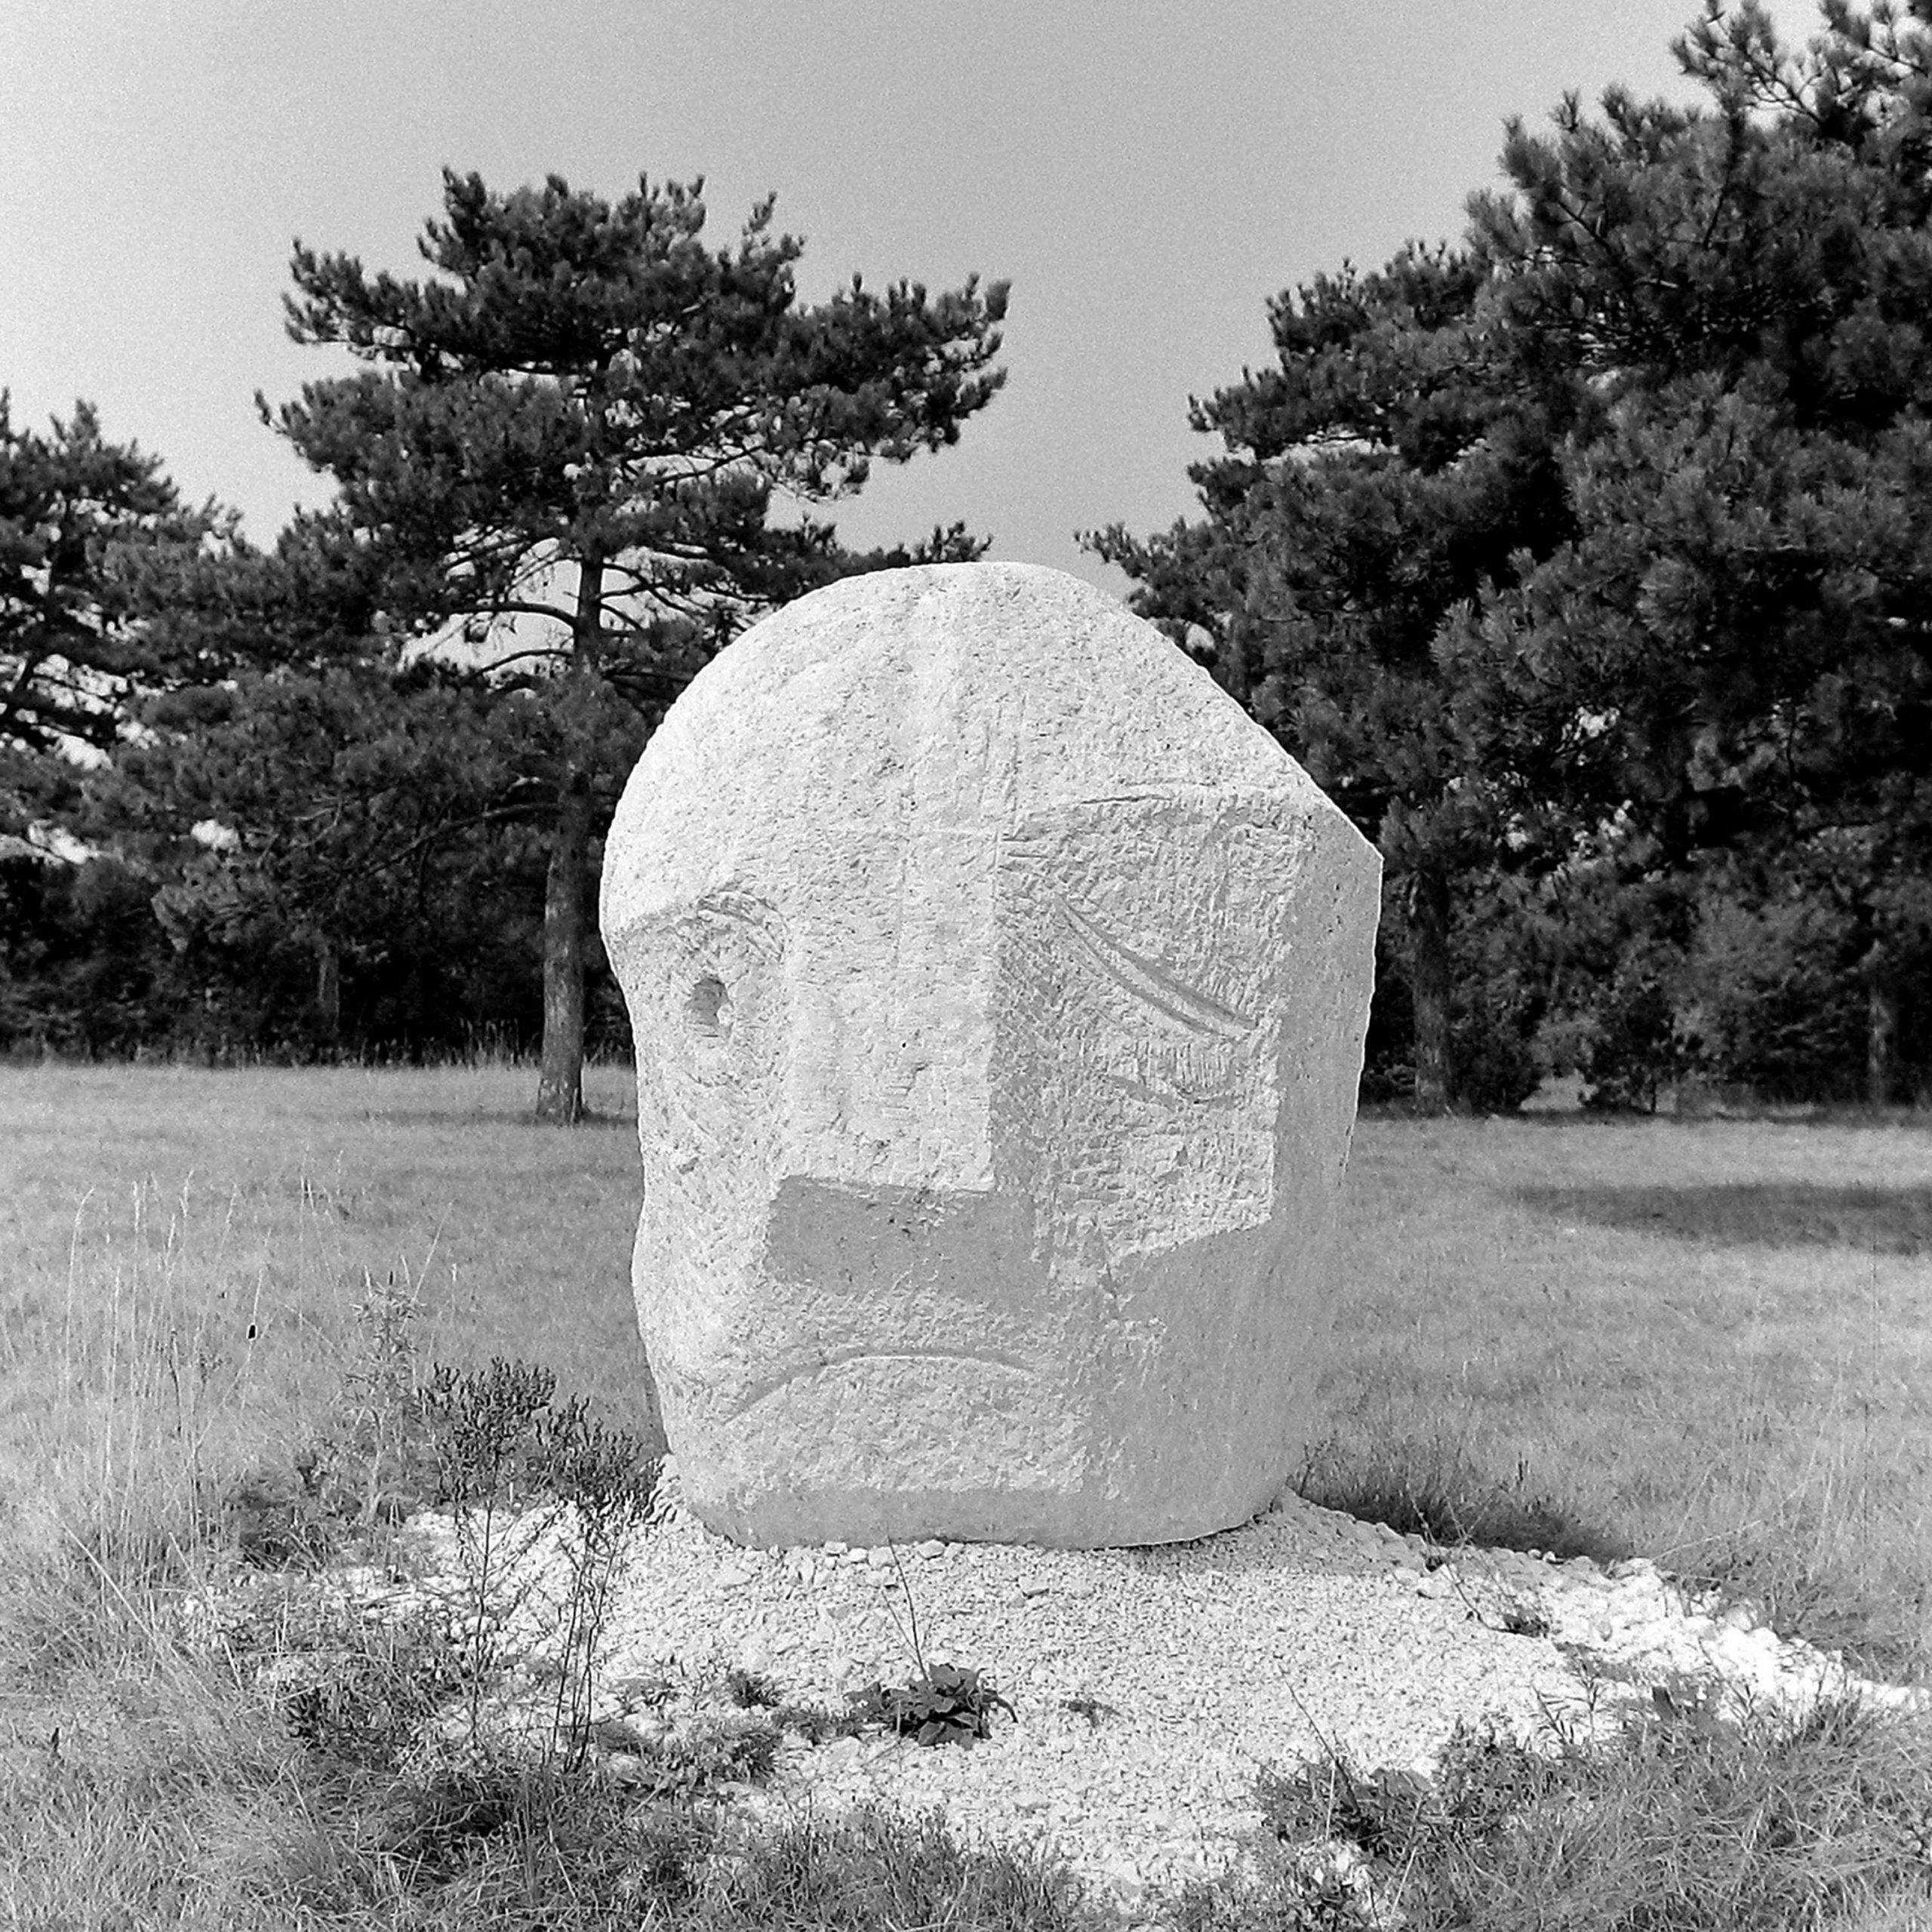 Vanja Radauš, La Testa, 1971